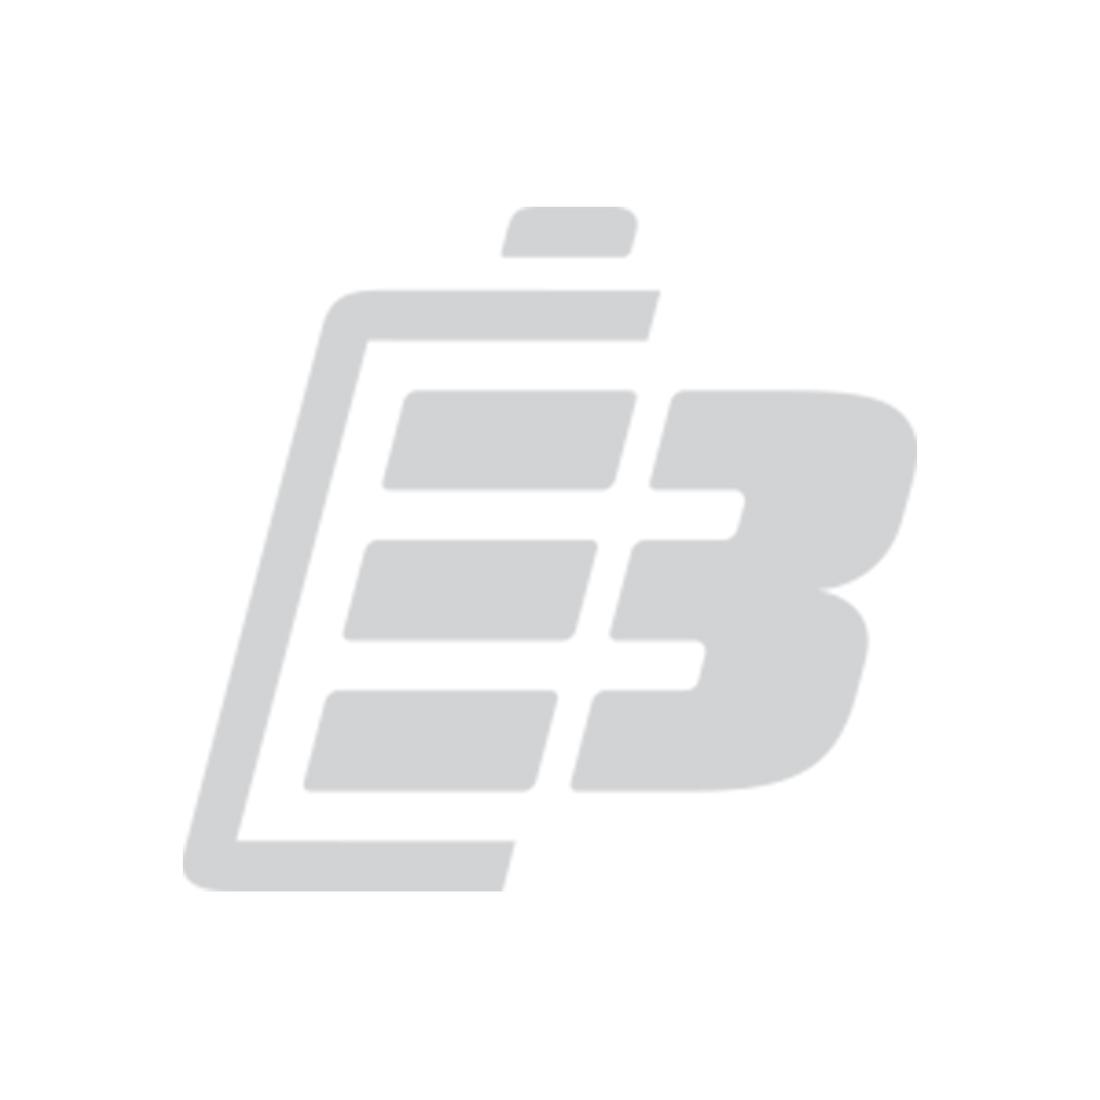 Laptop battery HP Pavilion dv9000_1